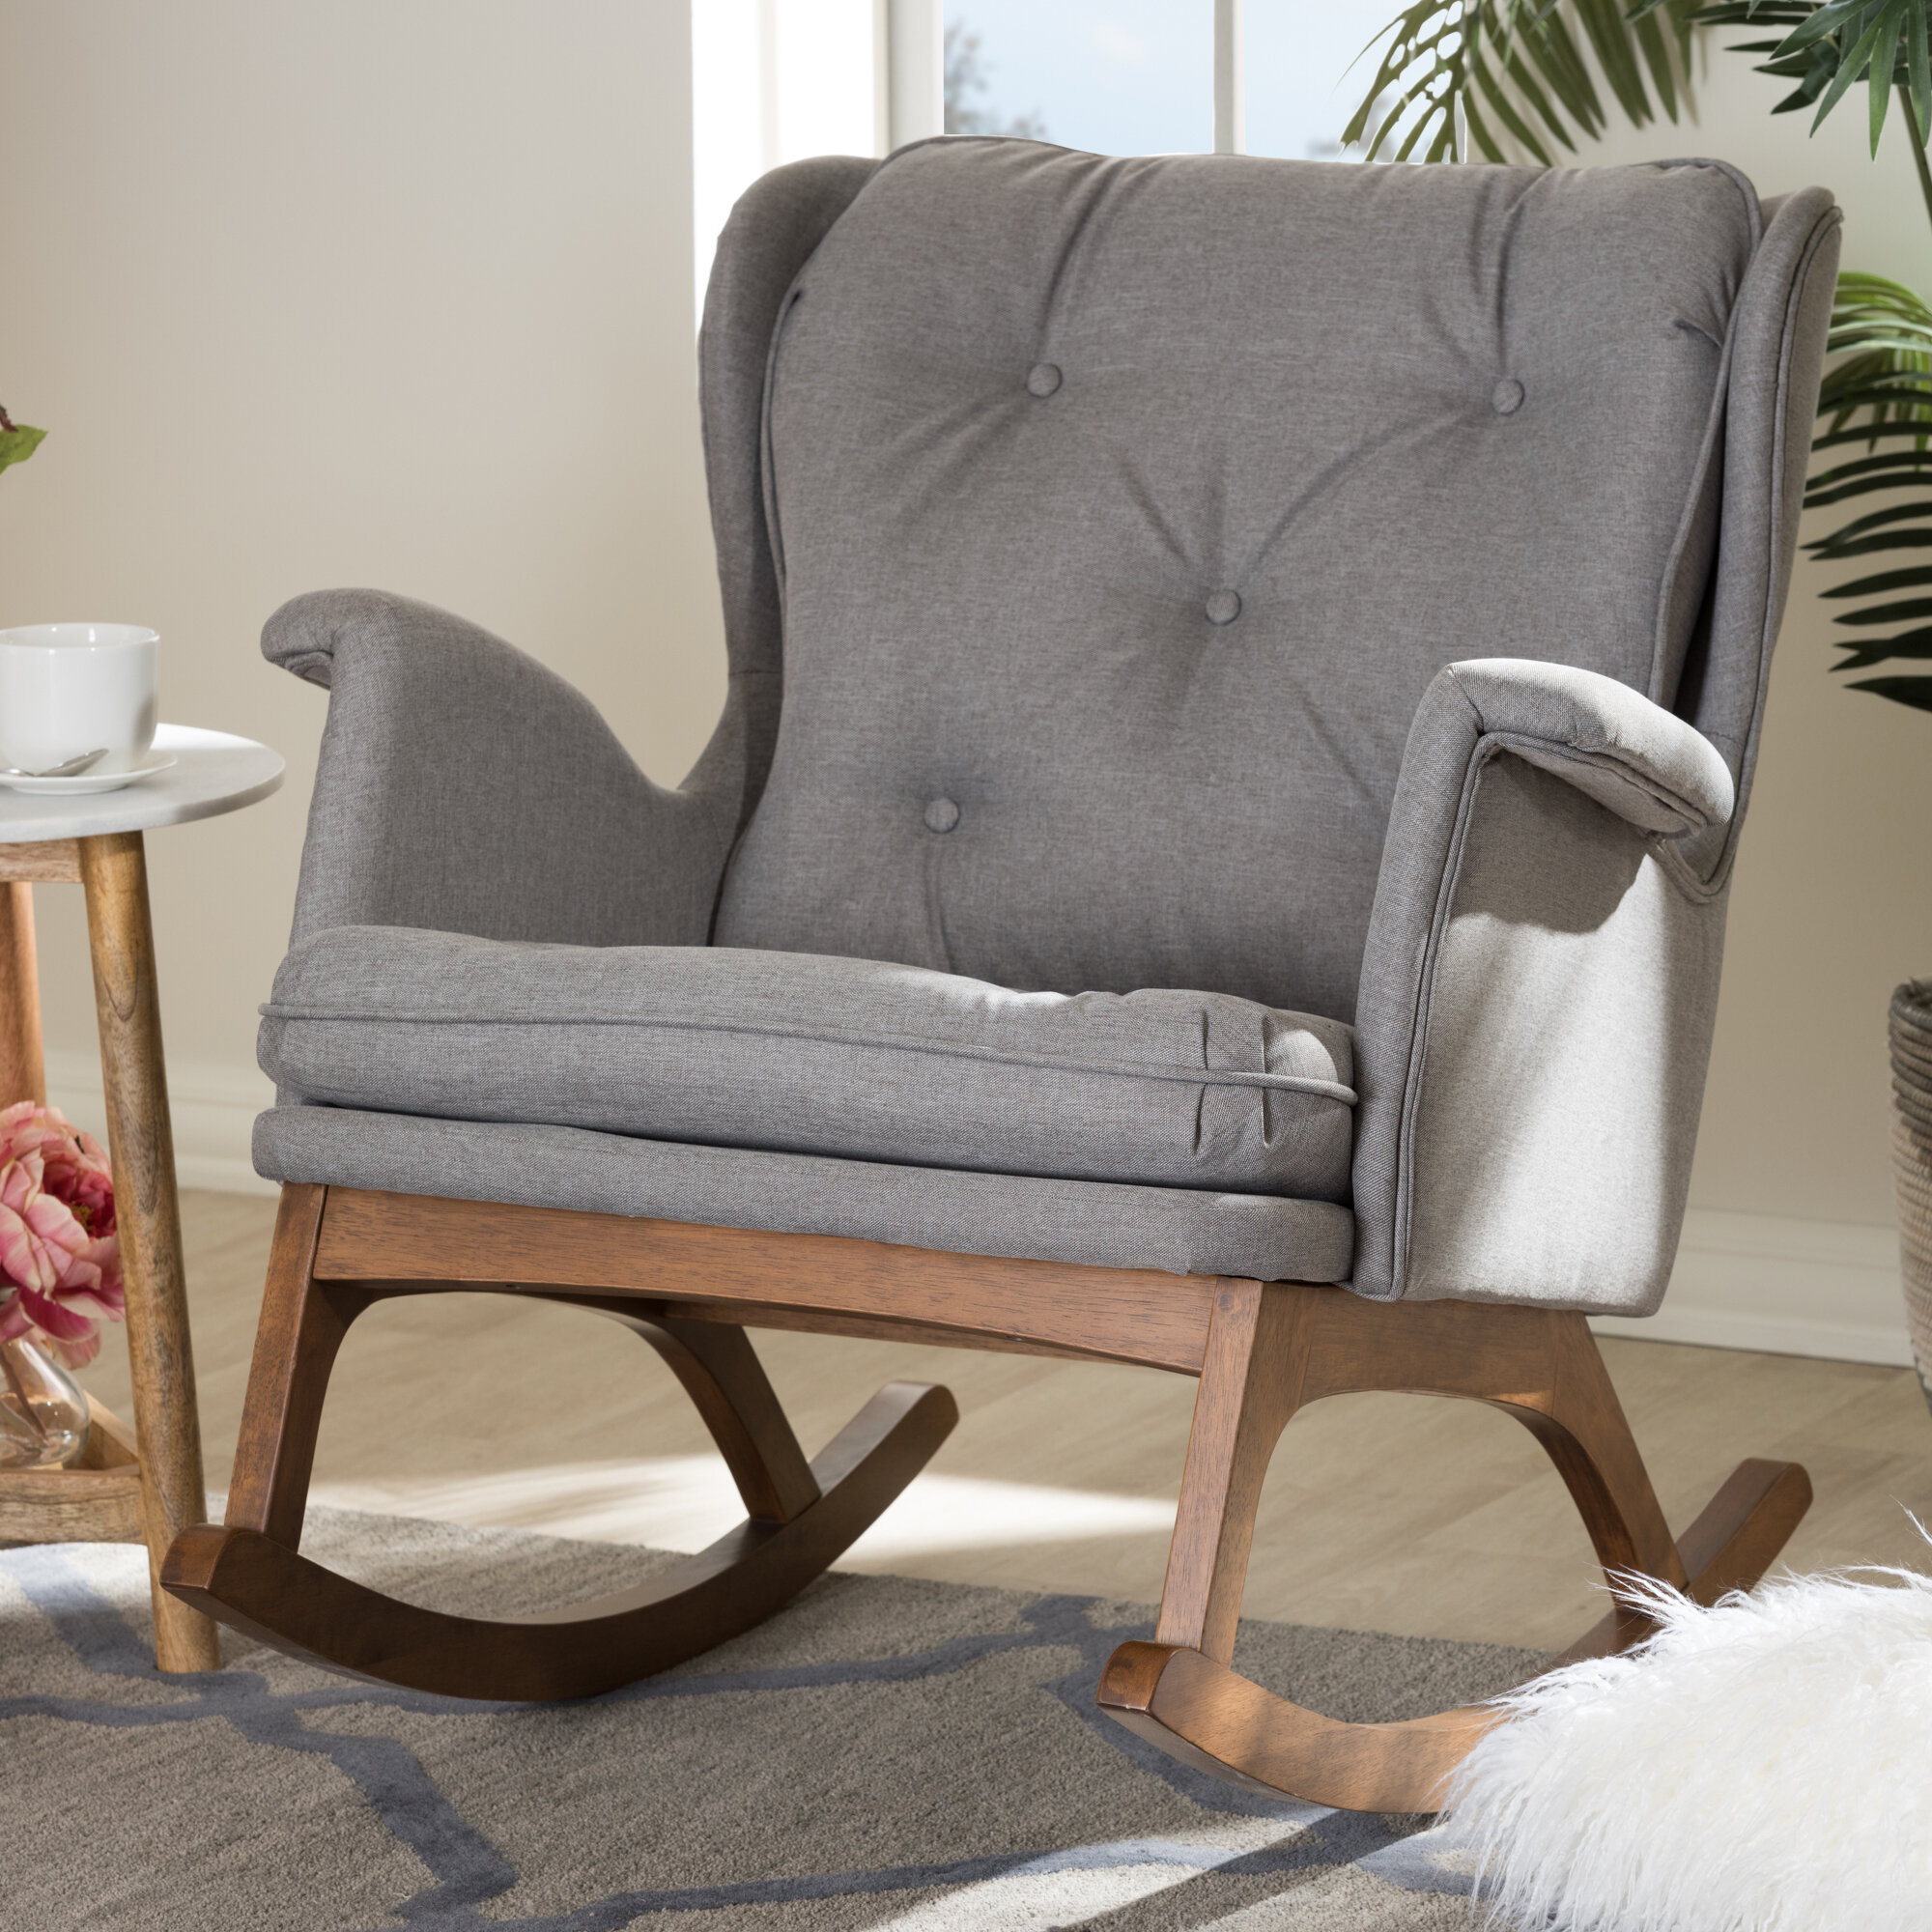 Superb Hanson Rocking Chair Theyellowbook Wood Chair Design Ideas Theyellowbookinfo